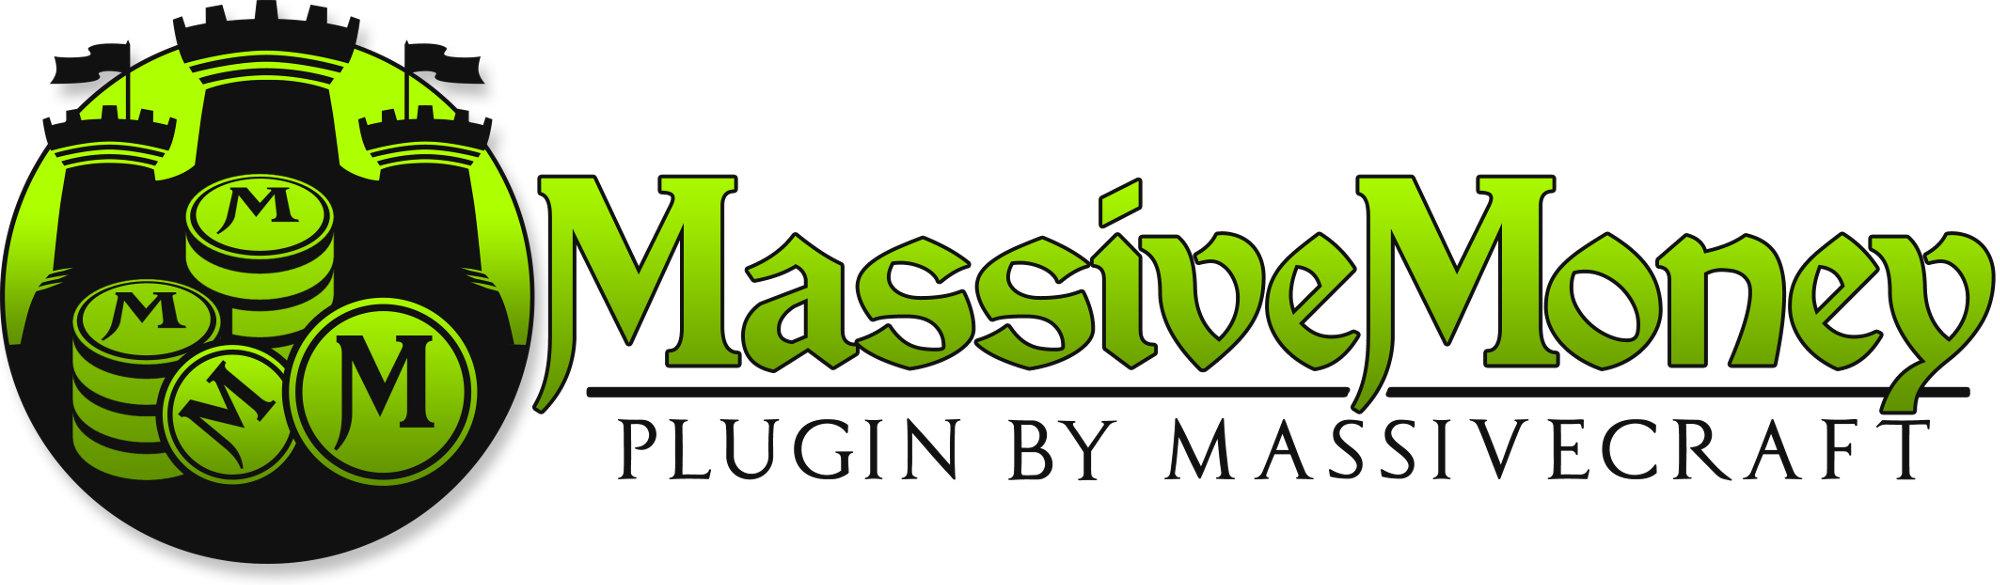 massivecraft-logotype-plugin-massivemoney-2000